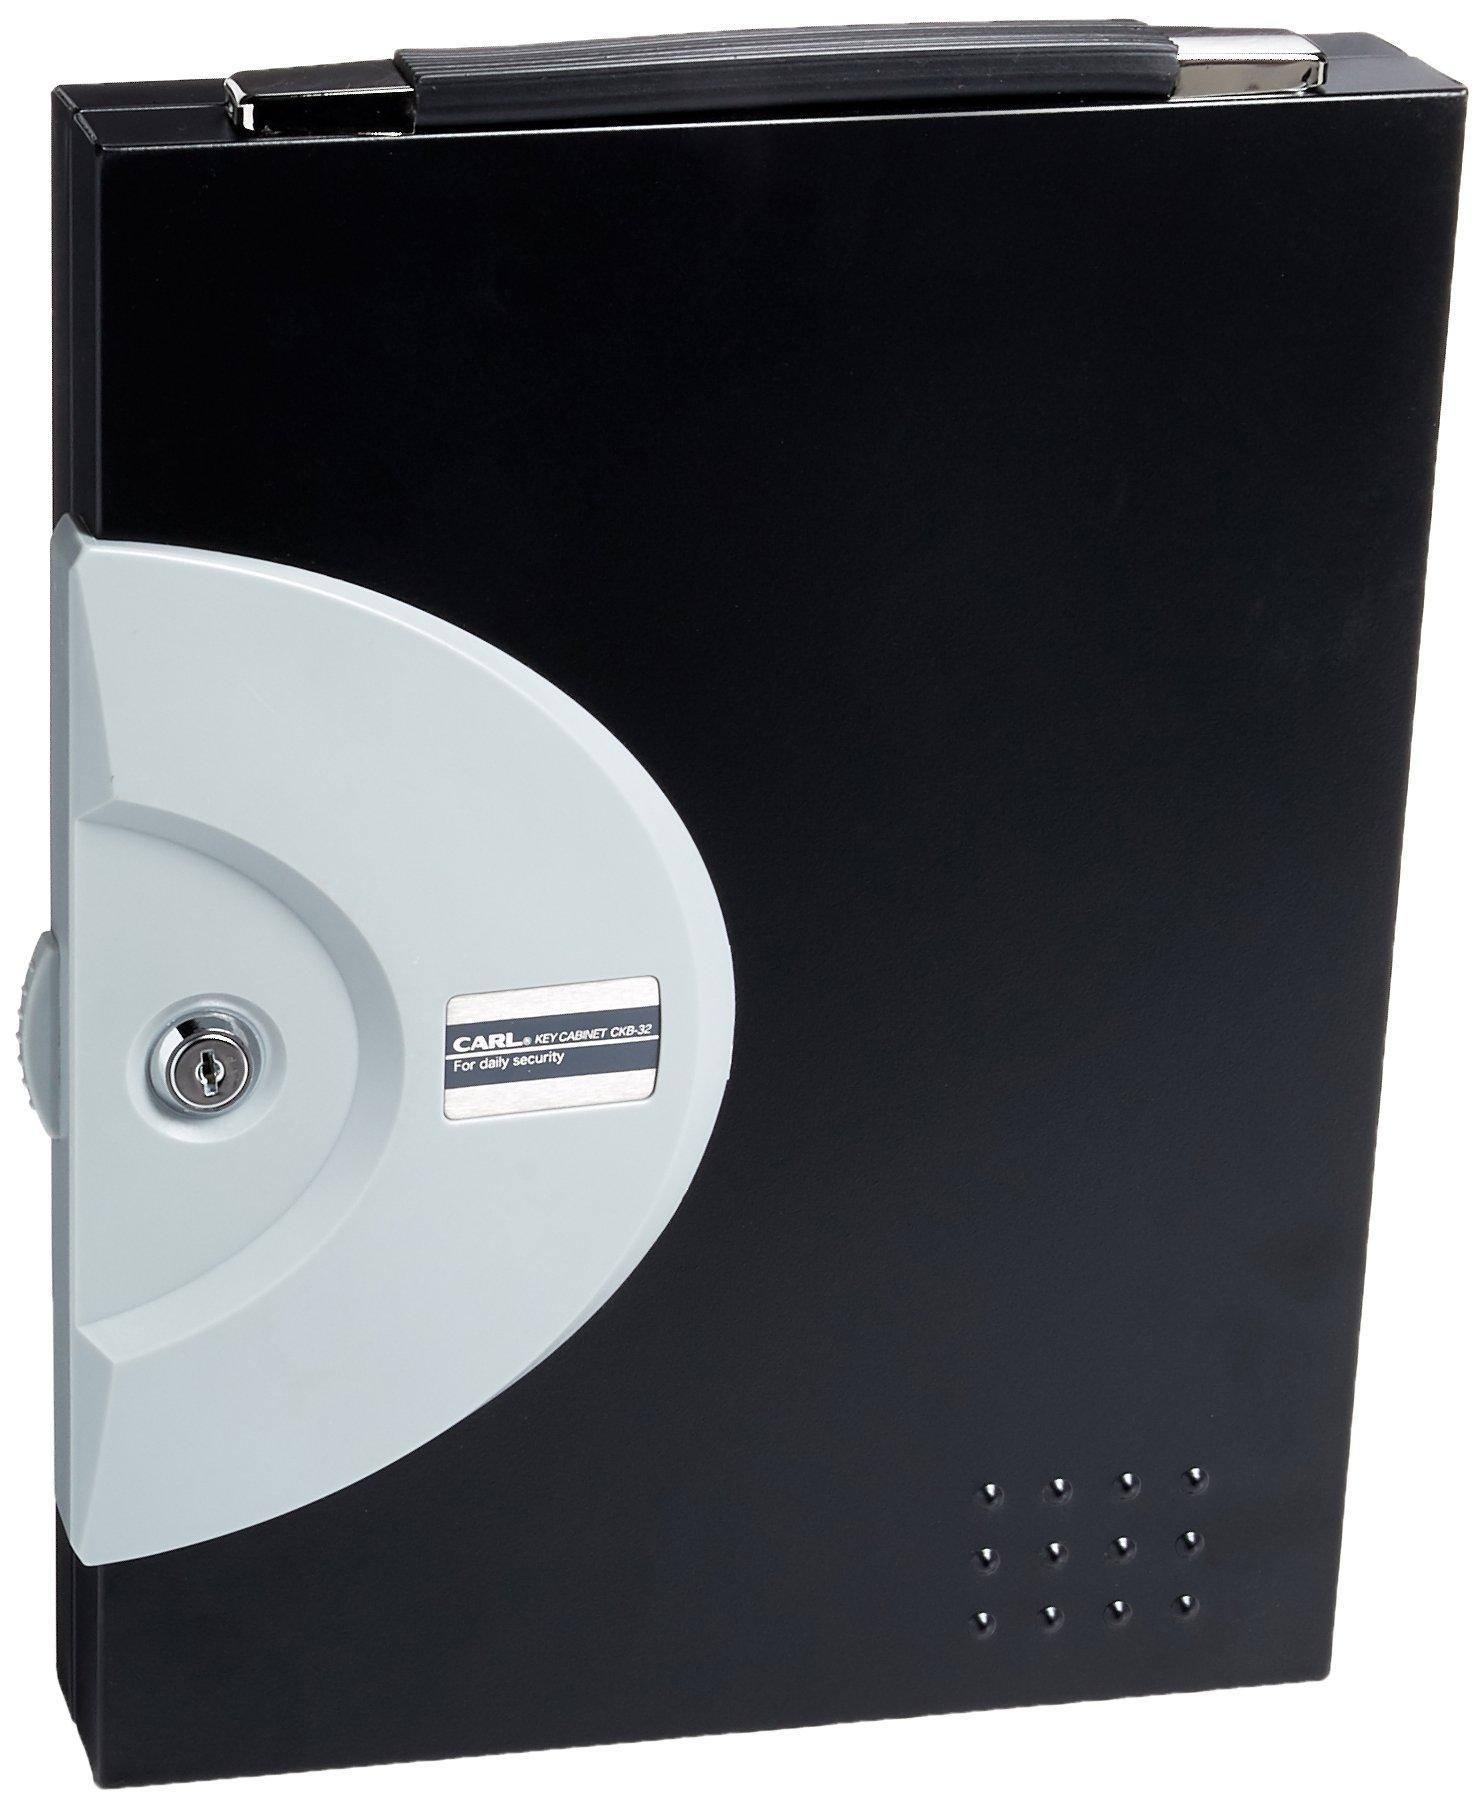 CARL CKB-32 32 Key Locking Cabinet, Black